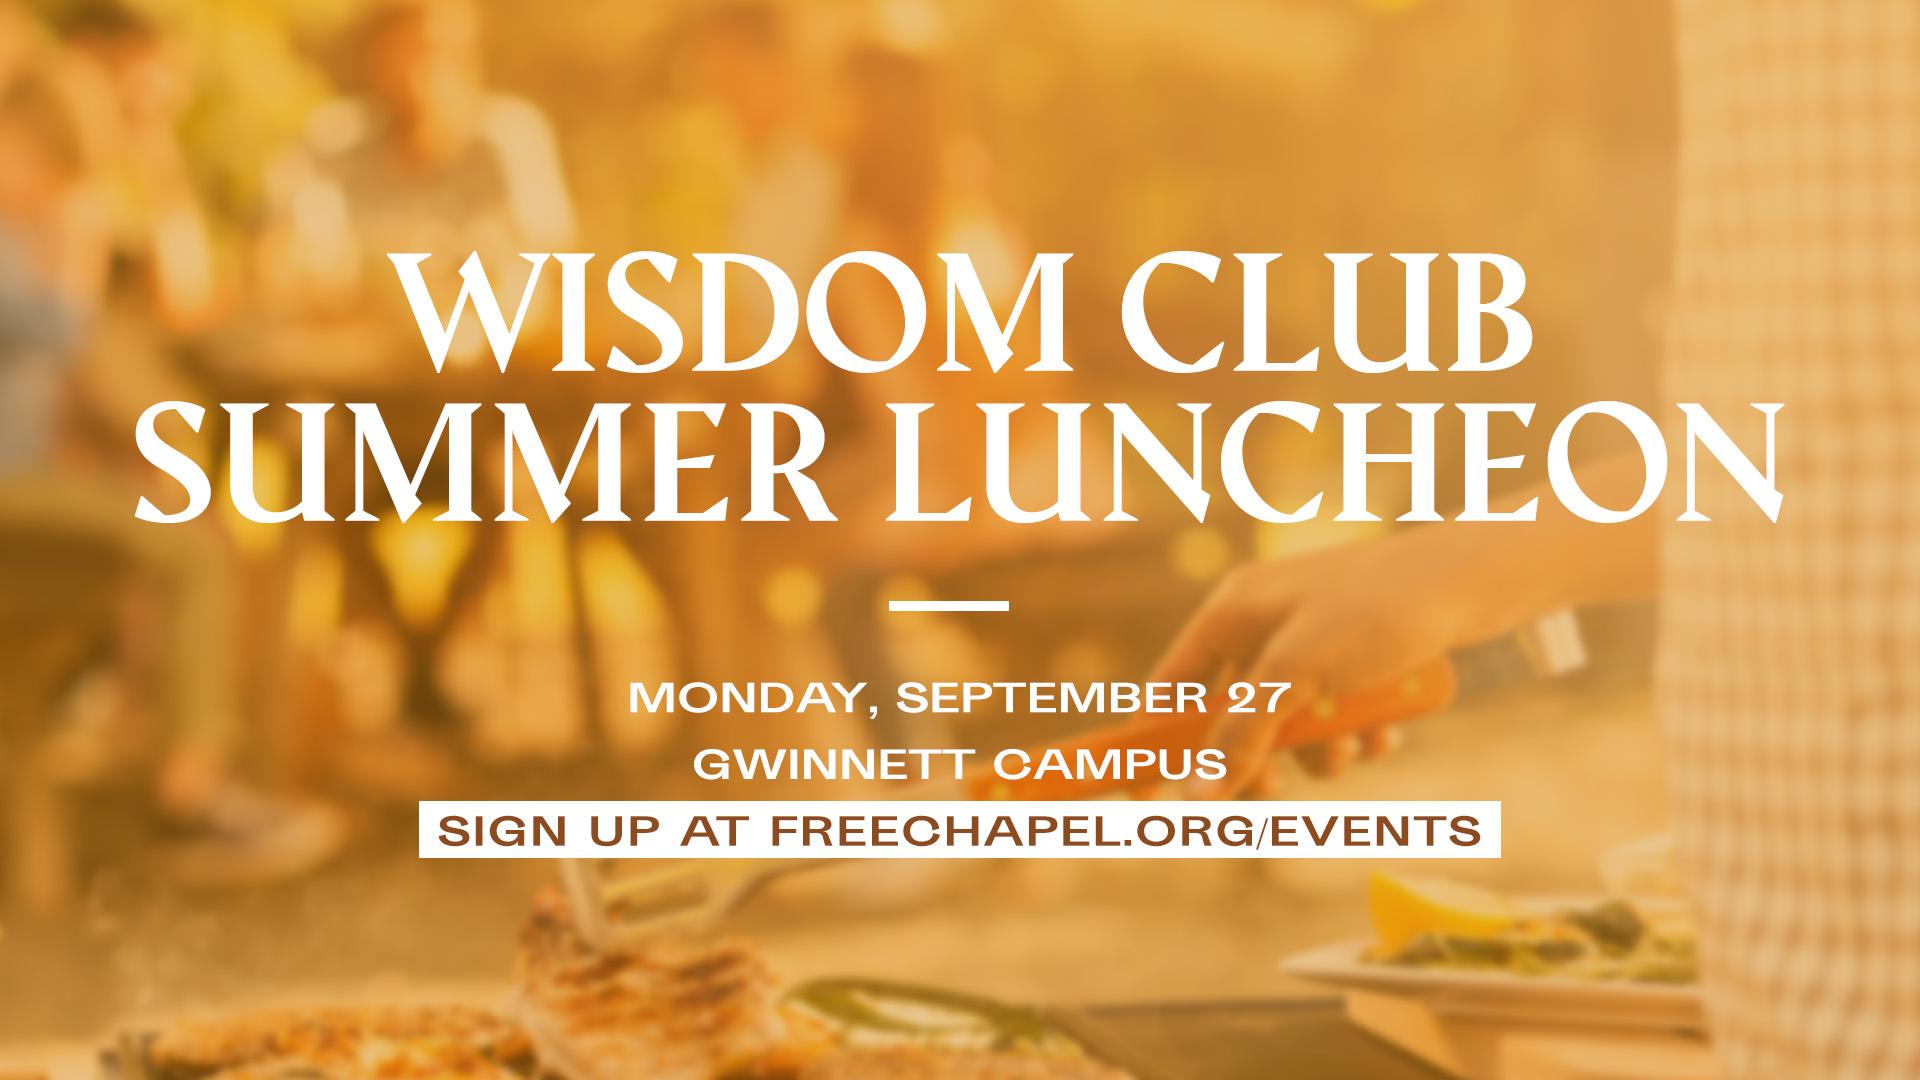 Wisdom Club Luncheon at the Gwinnett campus